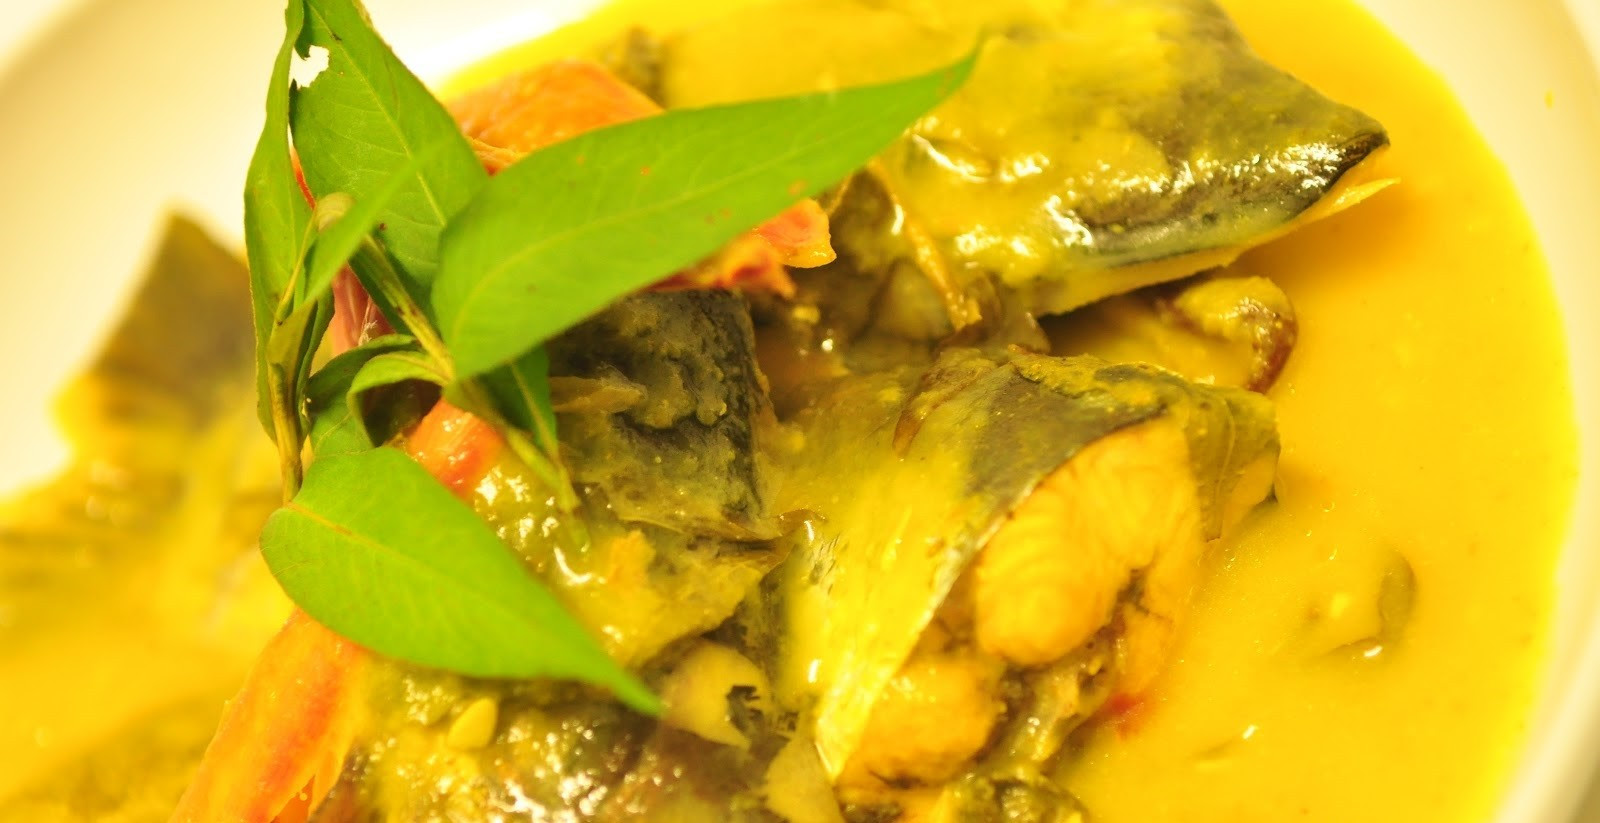 resepi ikan patin masak tempoyak simple agustus Resepi Ikan Rohu Masak Tempoyak Enak dan Mudah